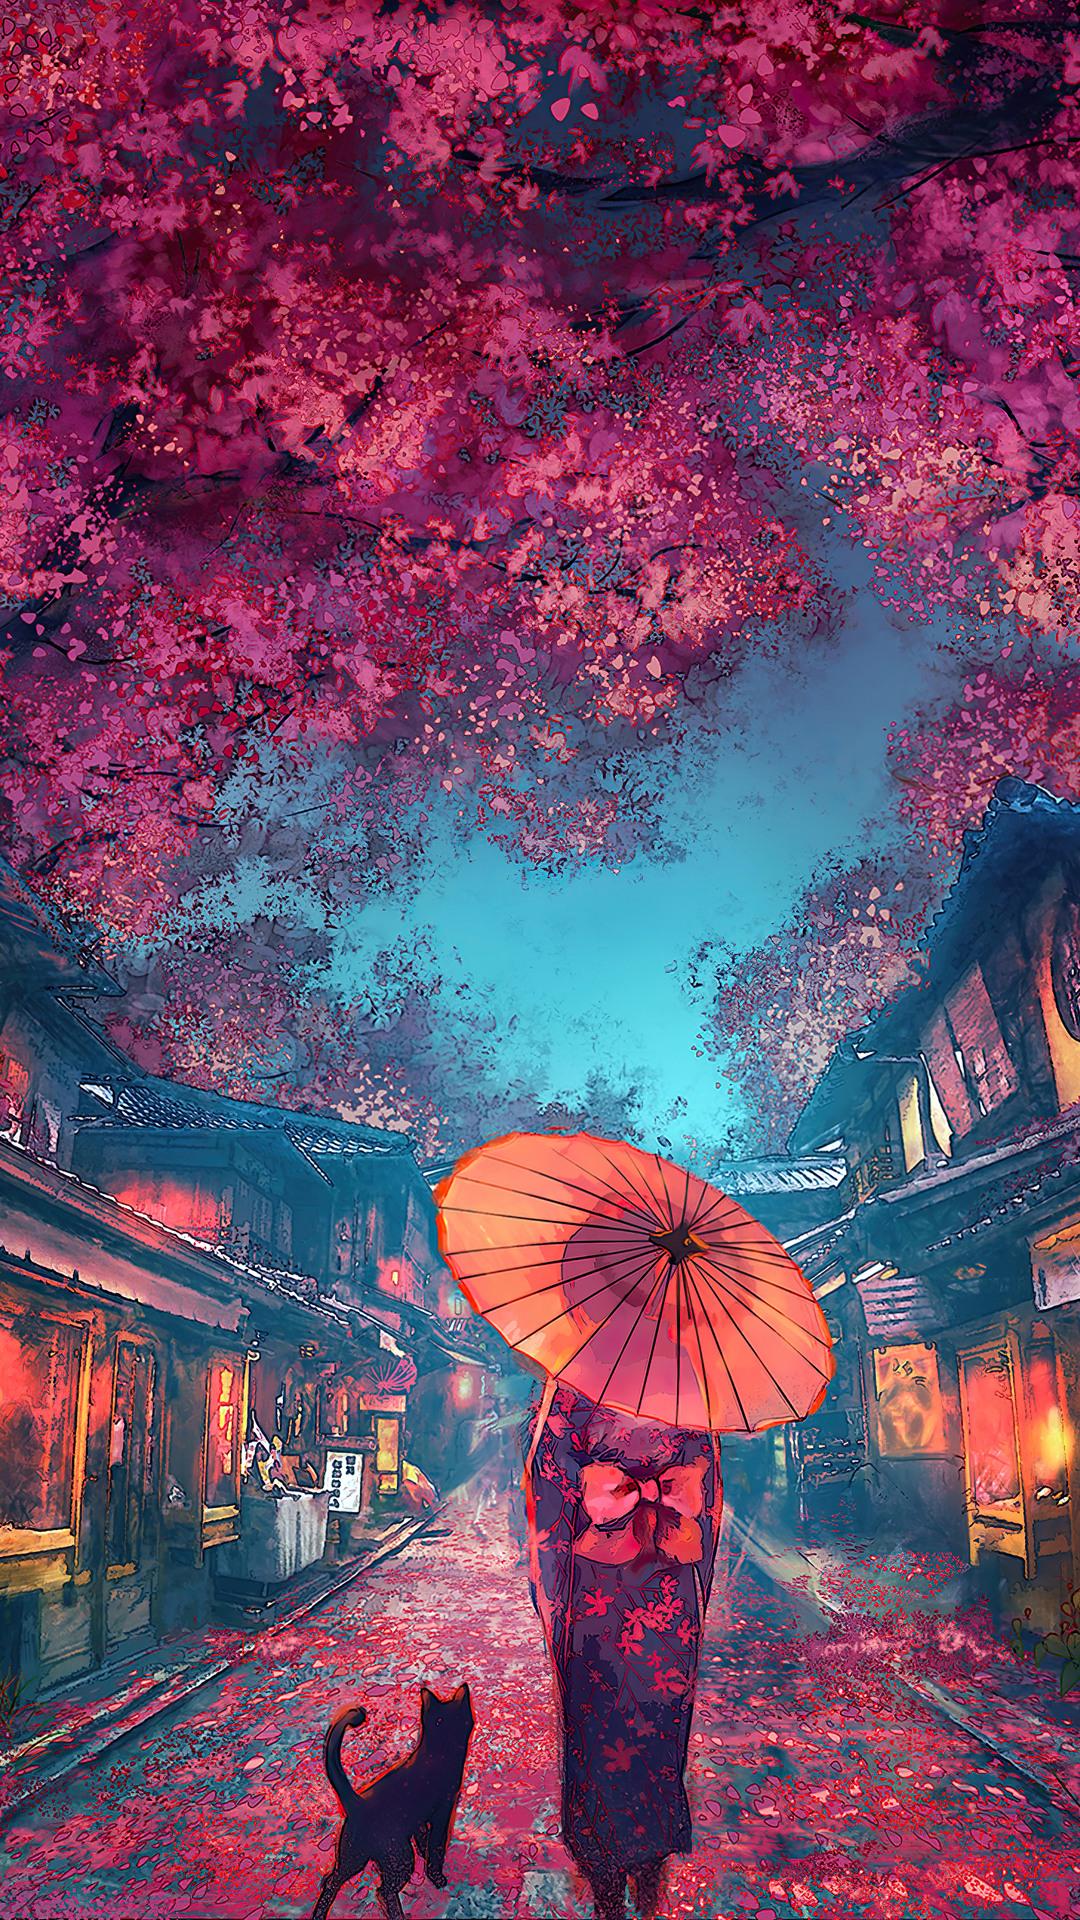 Beautiful Anime Street Scenery Cherry Blossom Kimono 4k Wallpaper 6 1621